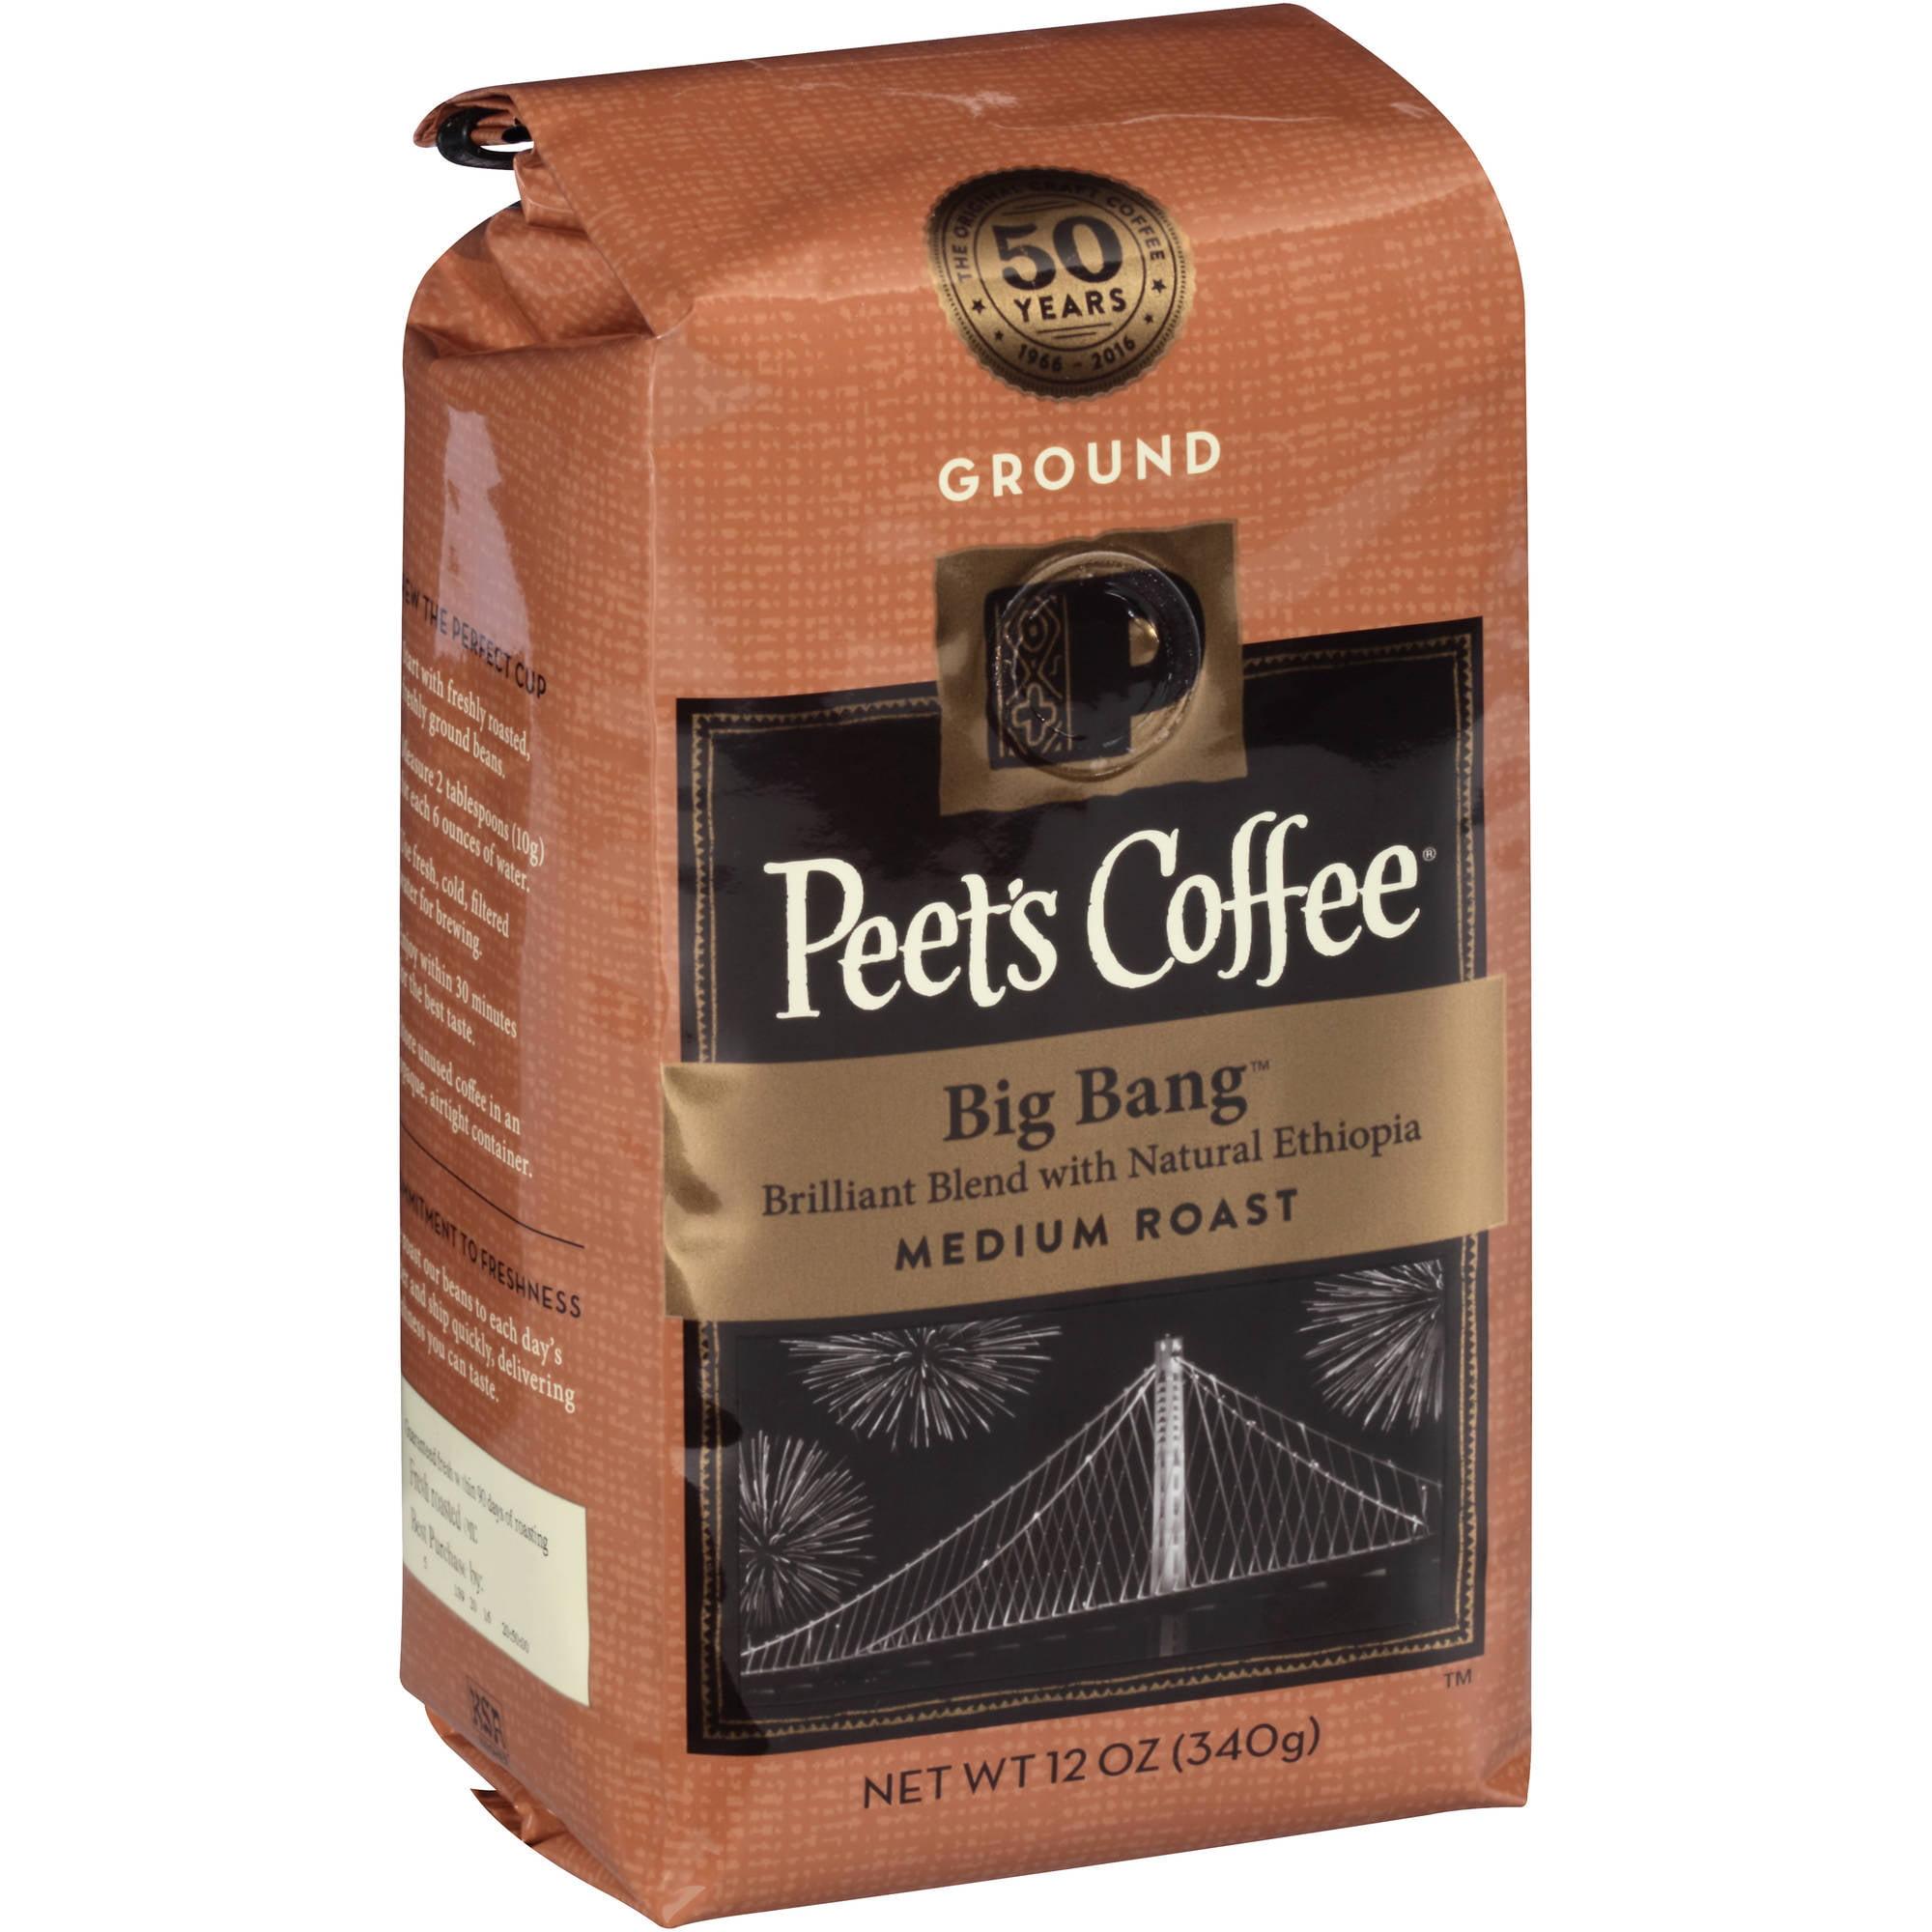 Peet's Coffee Big Bang Medium Roast Ground Coffee, 12 oz